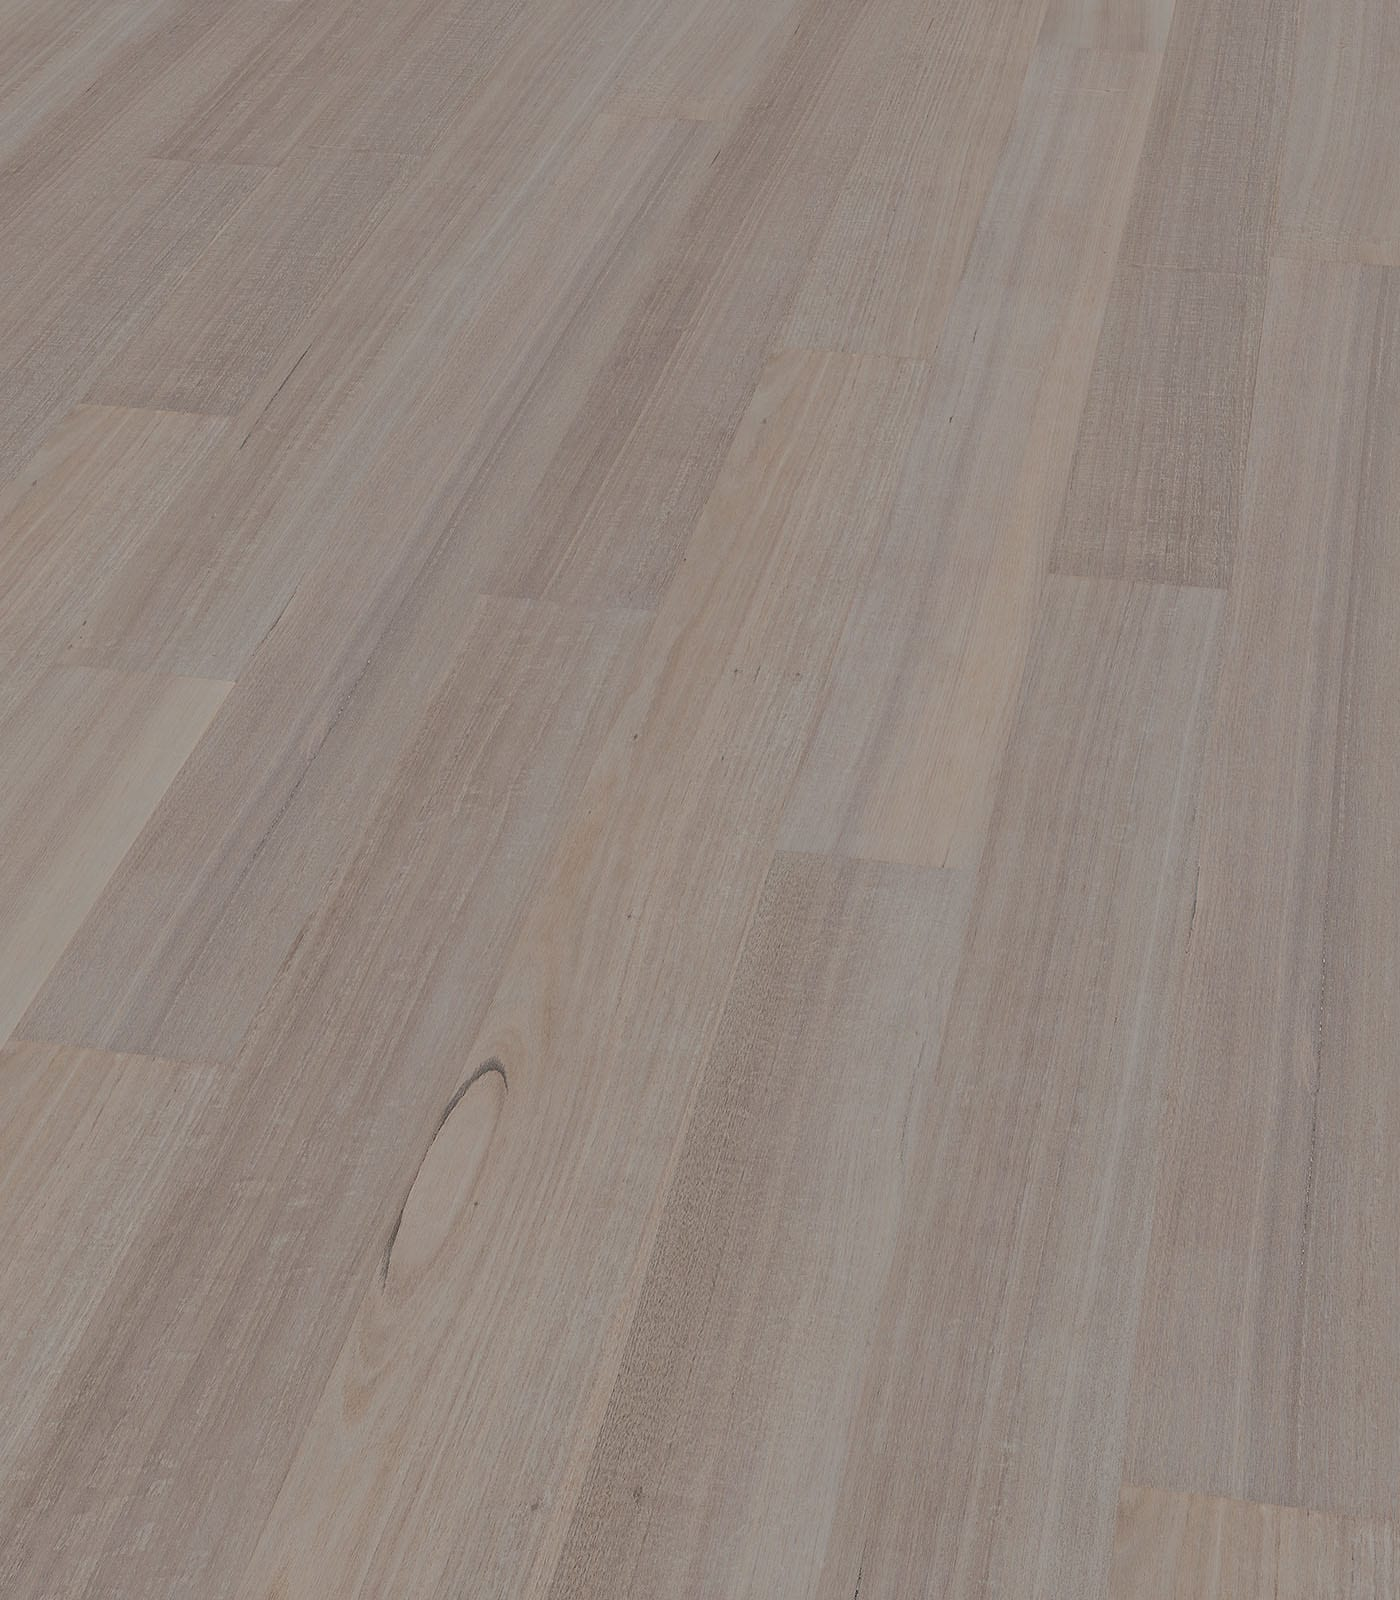 Canberra-Tasmanian Oak Floors-After Oak Collection-angle